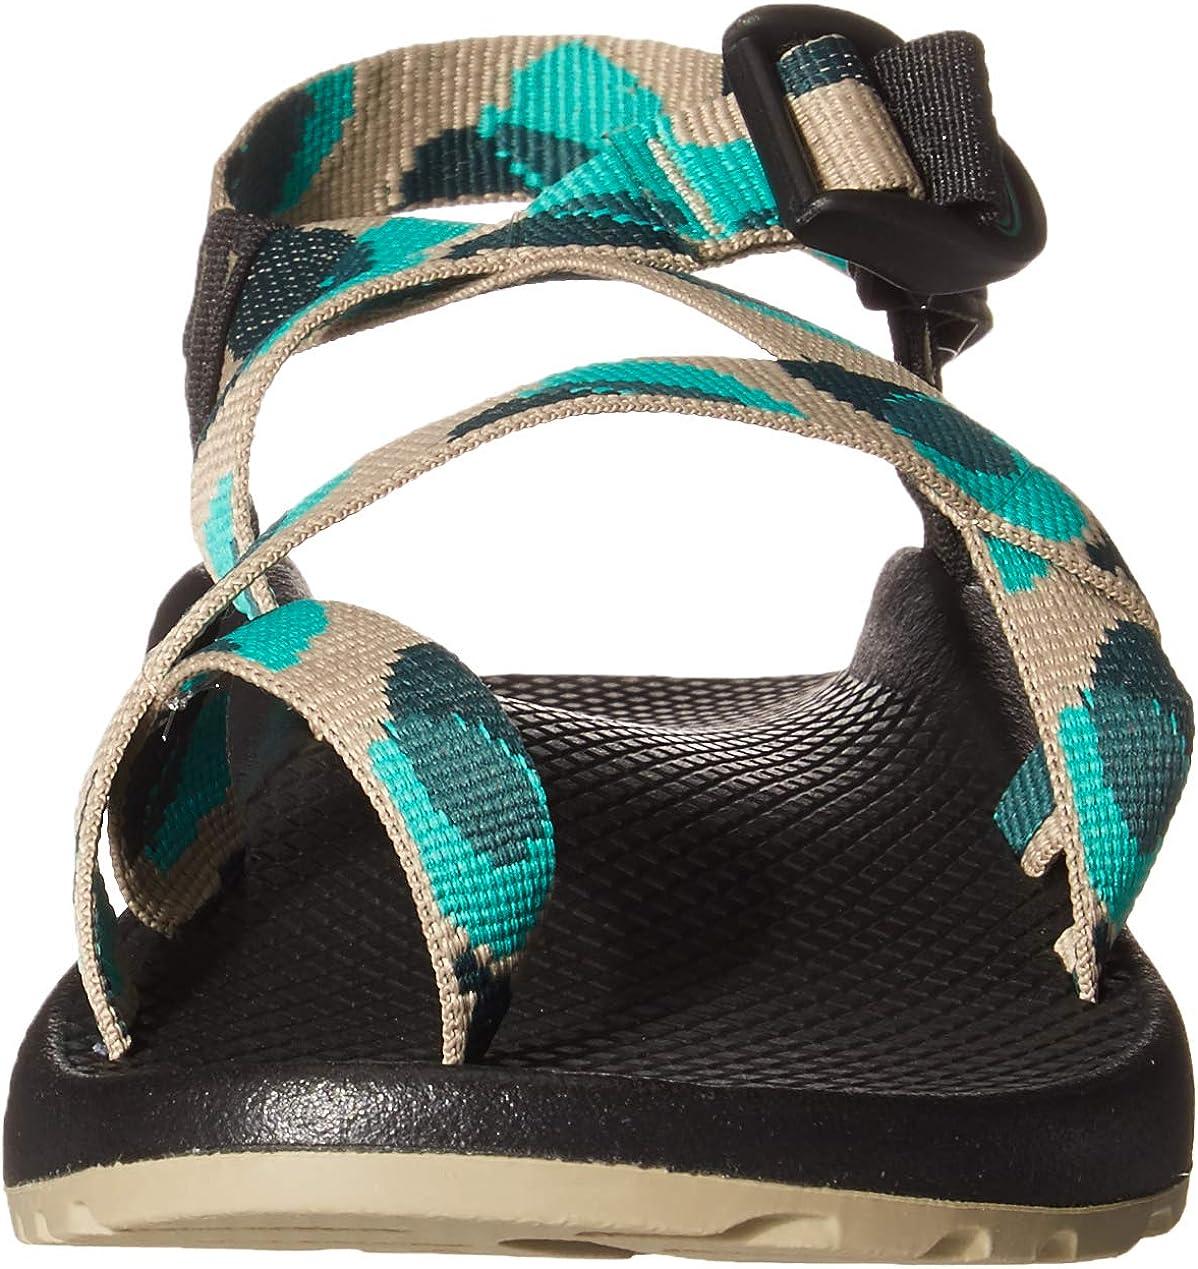 Chaco Women's Z2 Classic Sandal Filter Pine